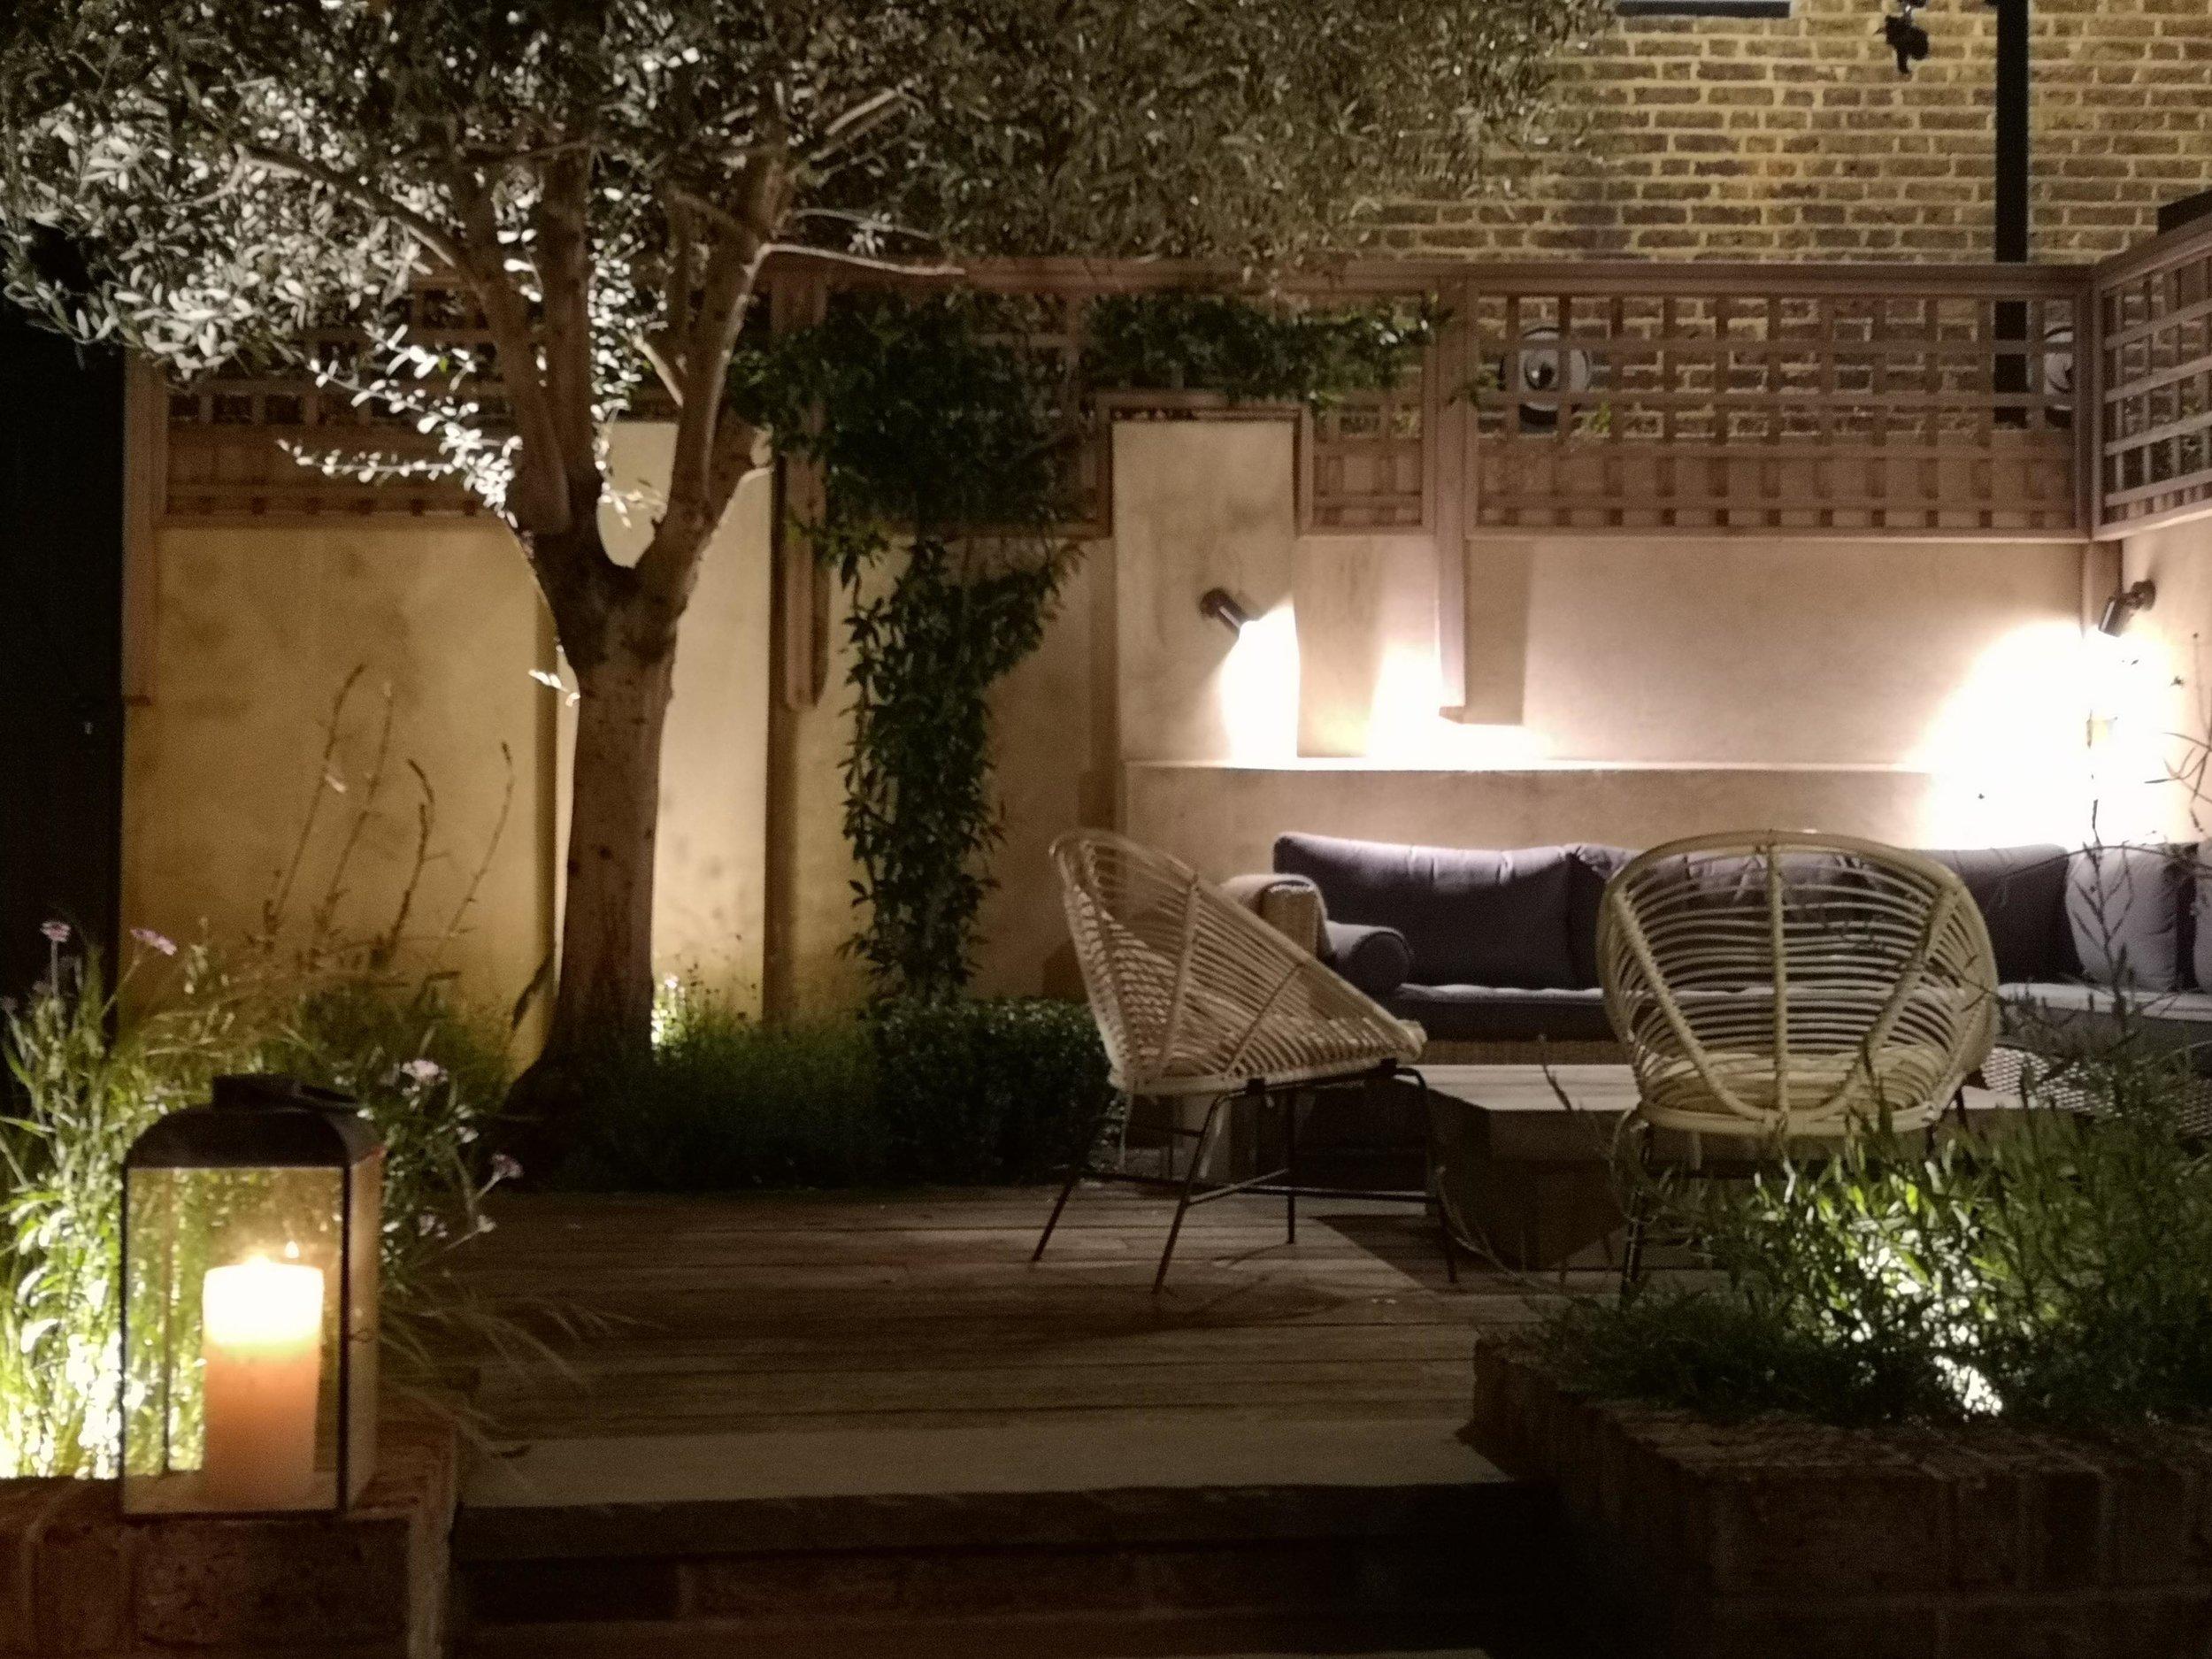 Back_garden_night.jpg